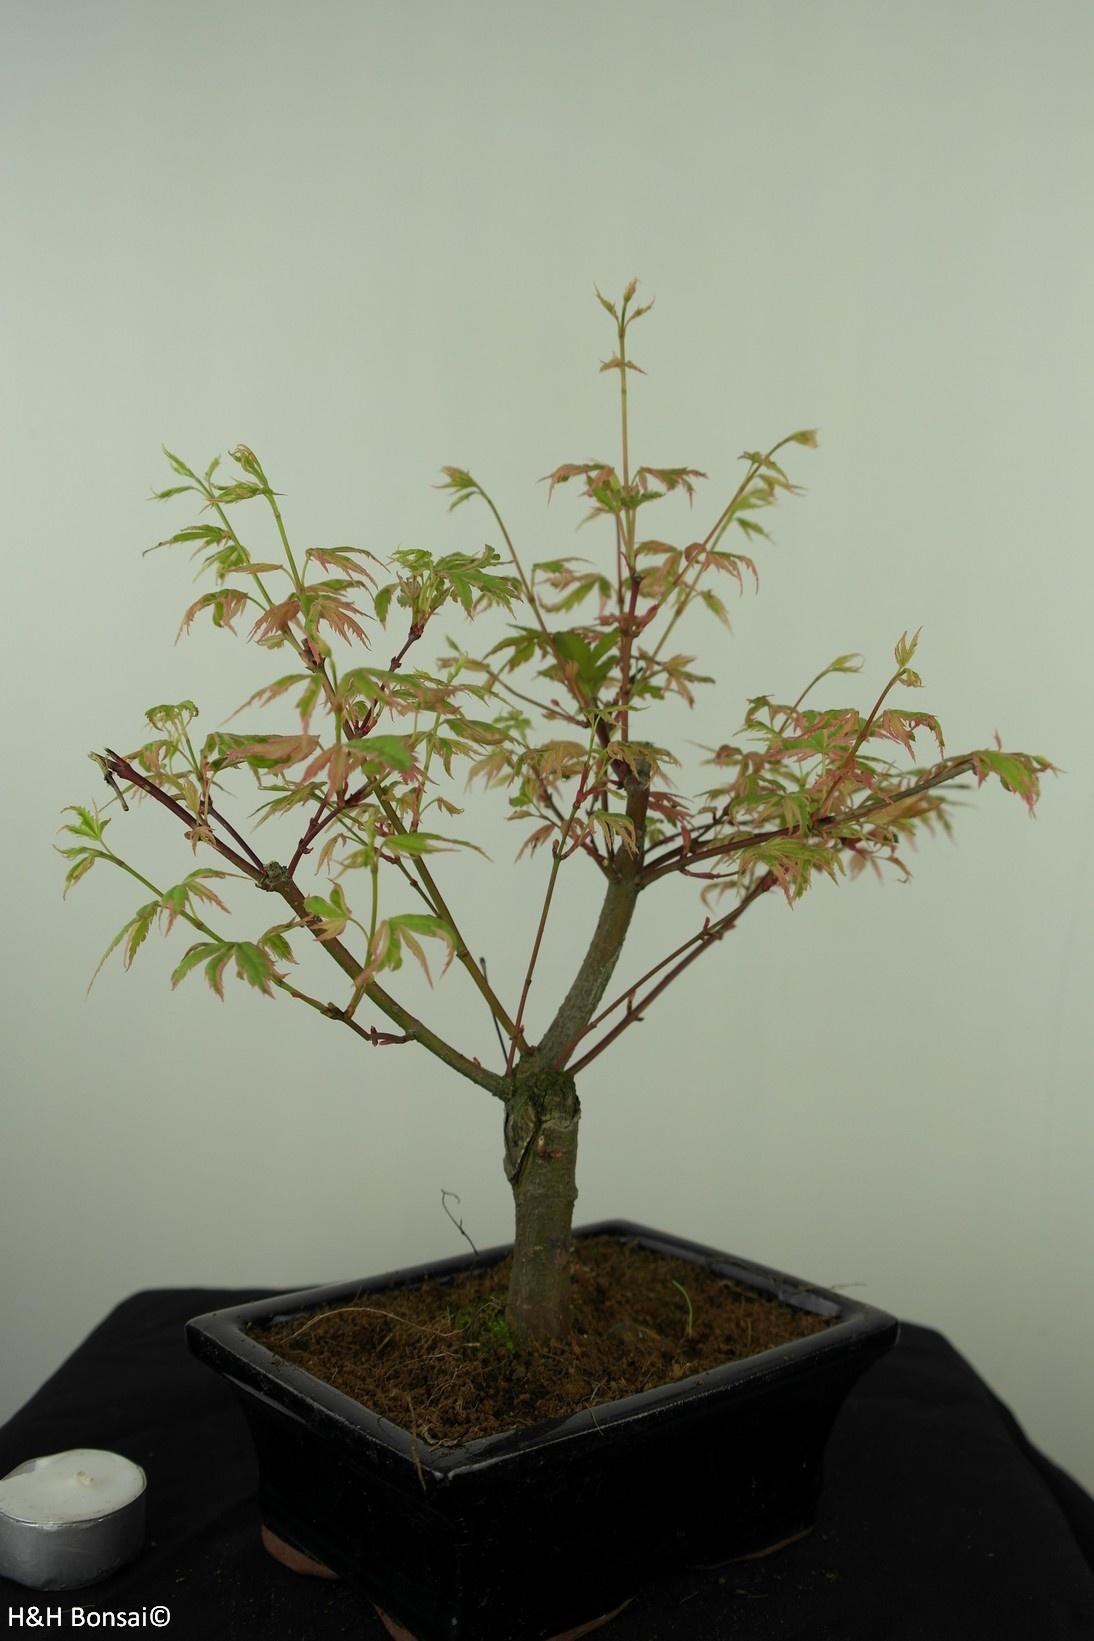 Bonsai Acer palmatum Batafurai, Butterfly, nr. 7548